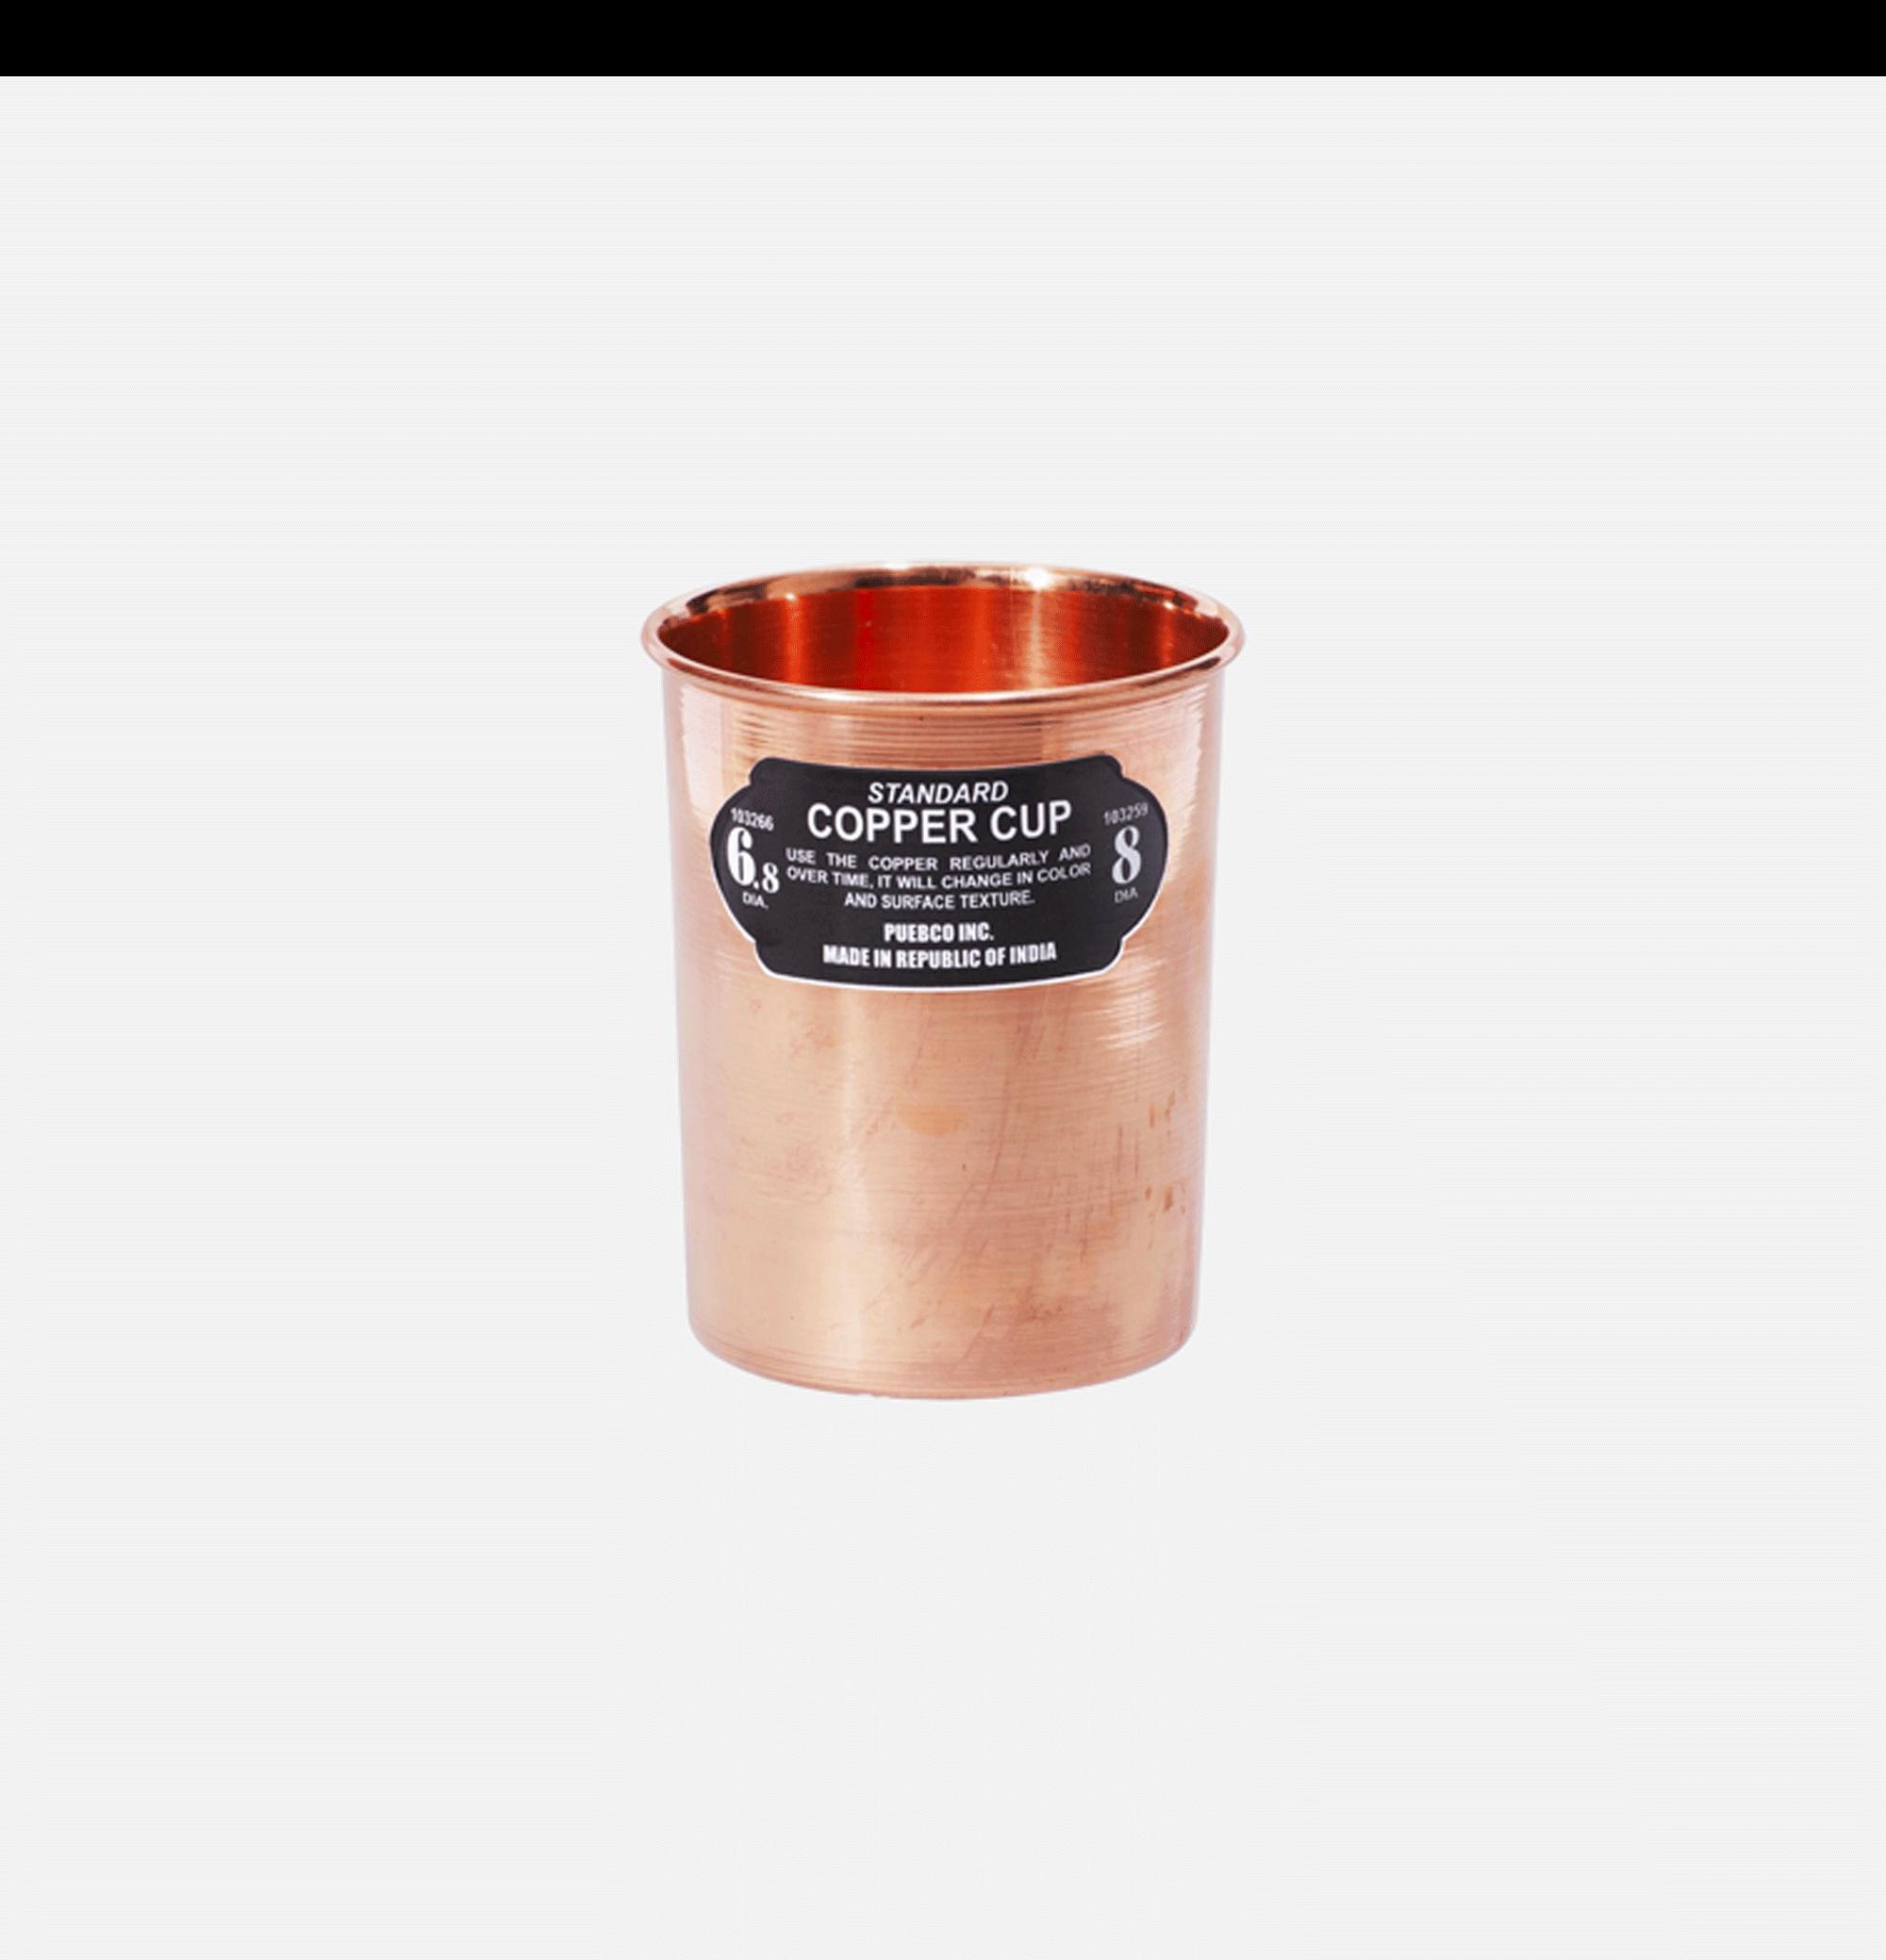 Copper Cup